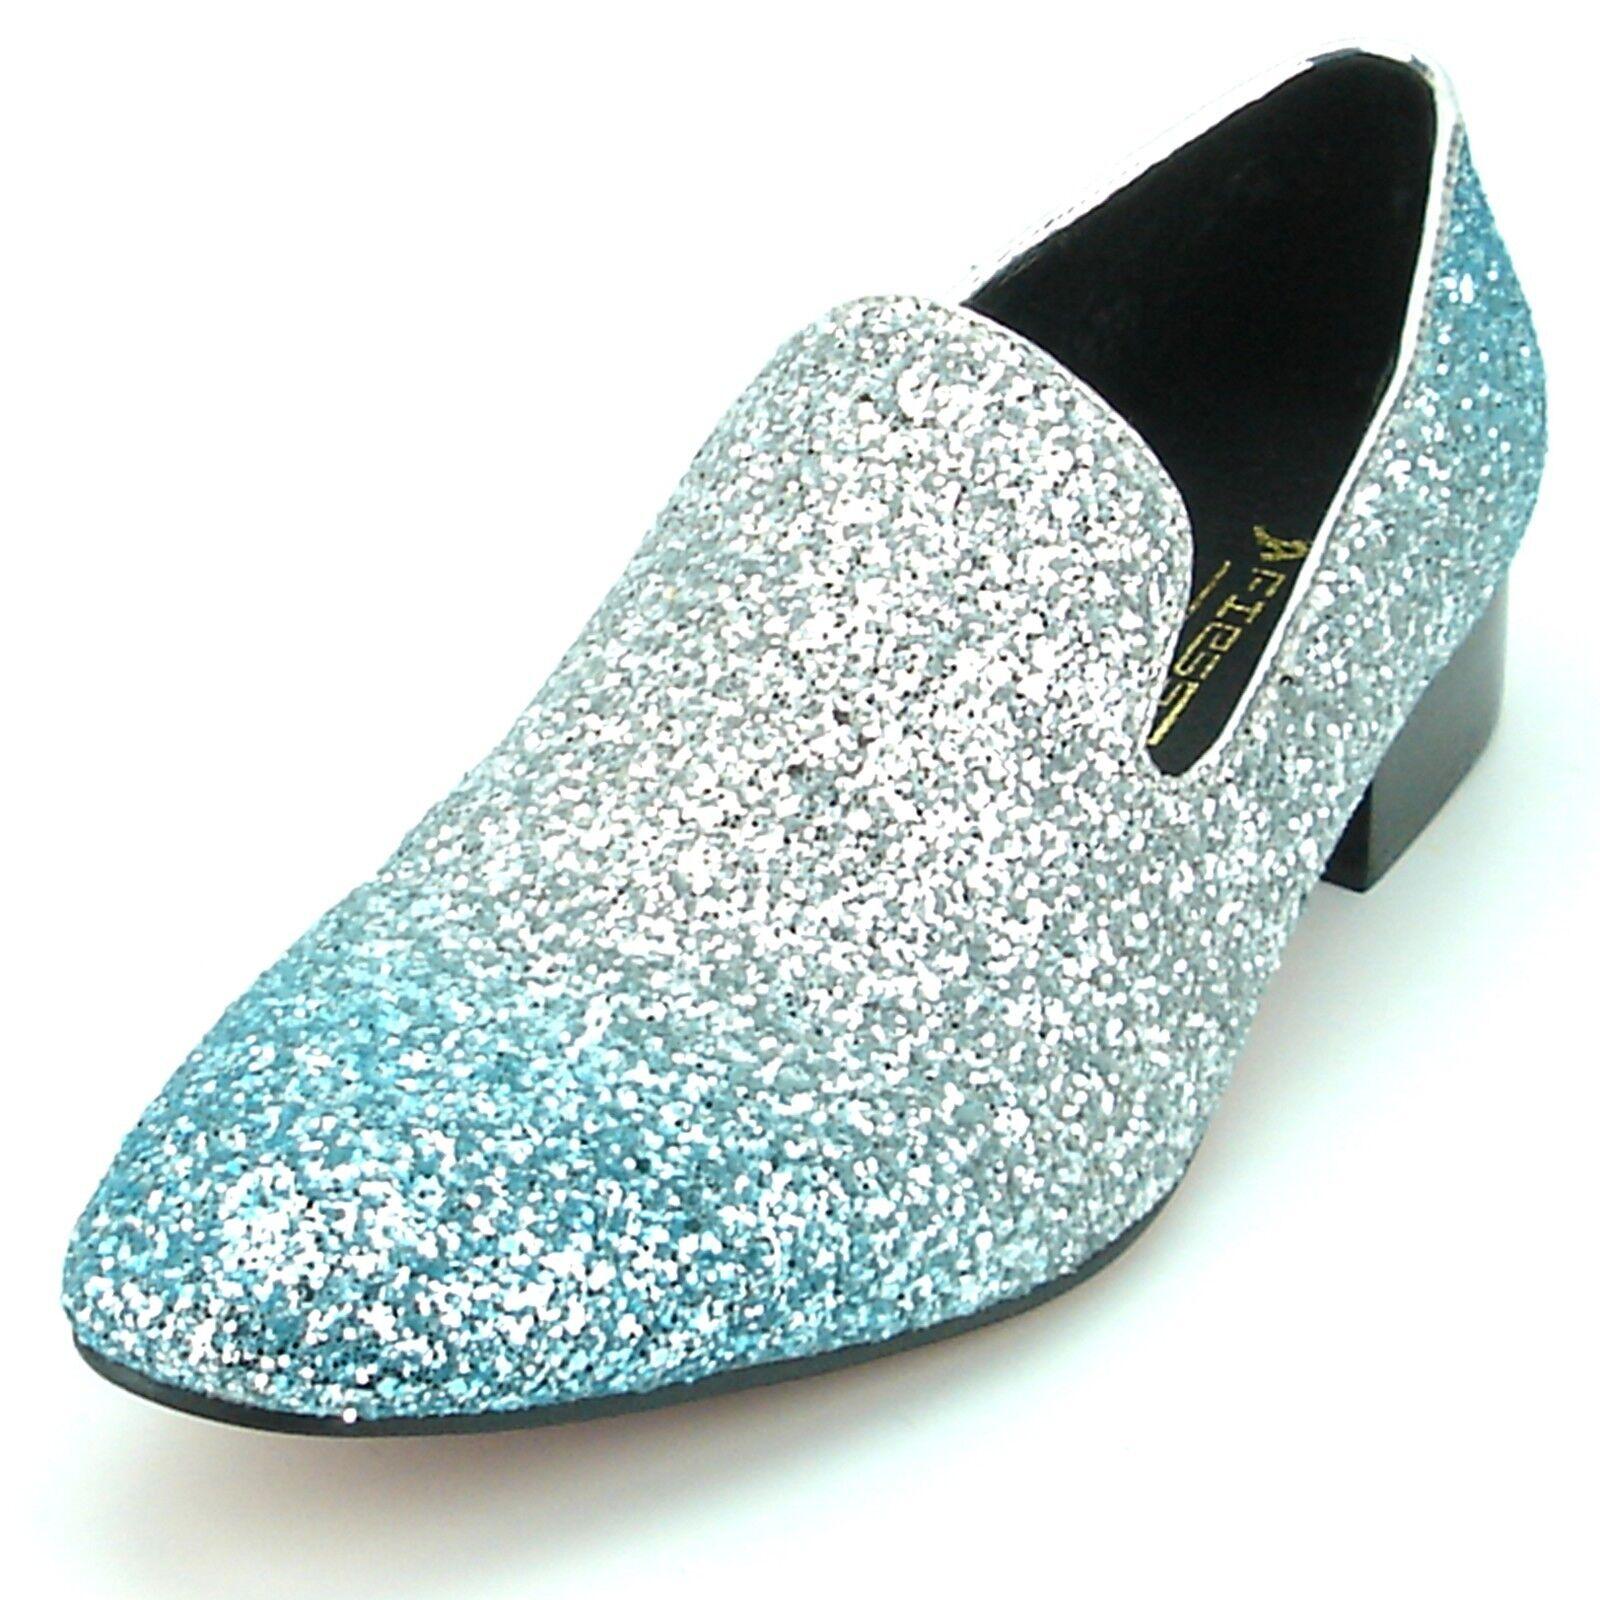 FI-7156 argent bleu Glitter Slip On Mocassin FIESSO par Aurelio Garcia